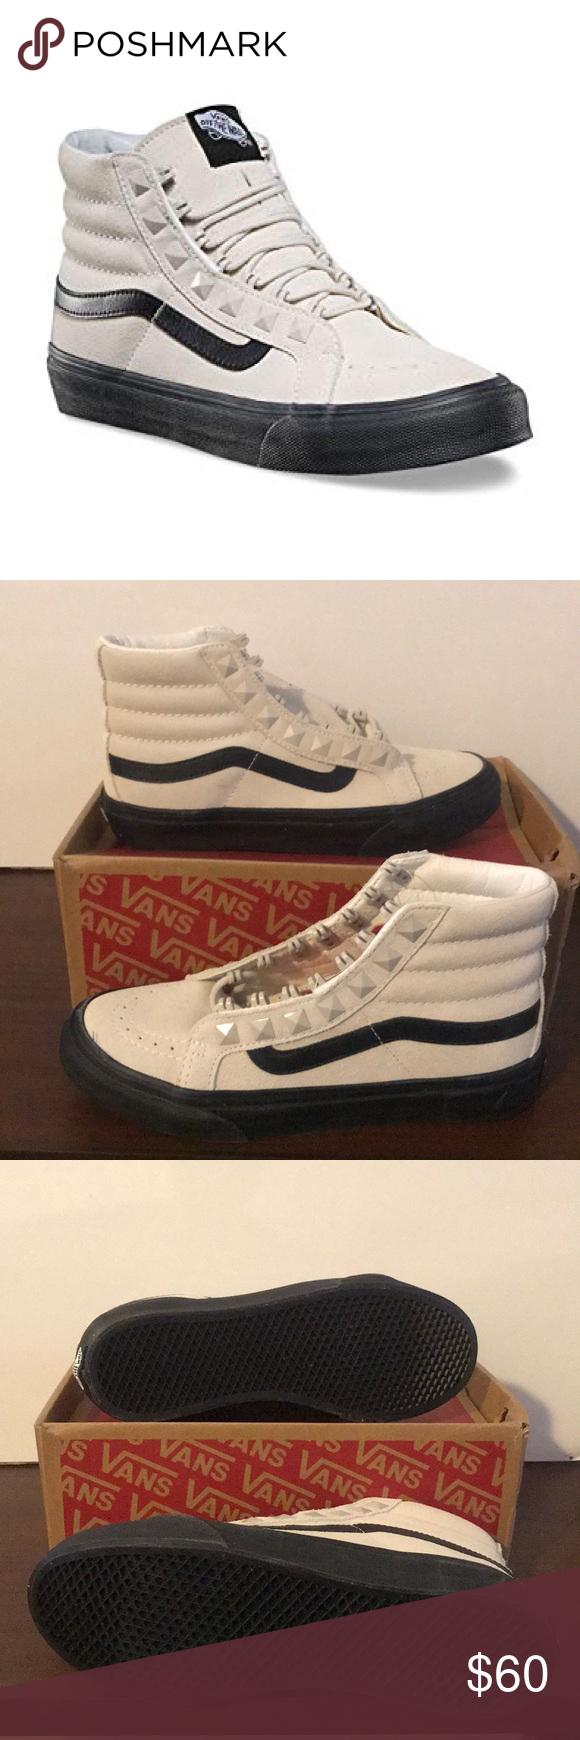 937982e49a6 Vans Sk8-Hi Slim Studs Vans Sk8-Hi Slim Studs Marshmallow Black Vans Shoes